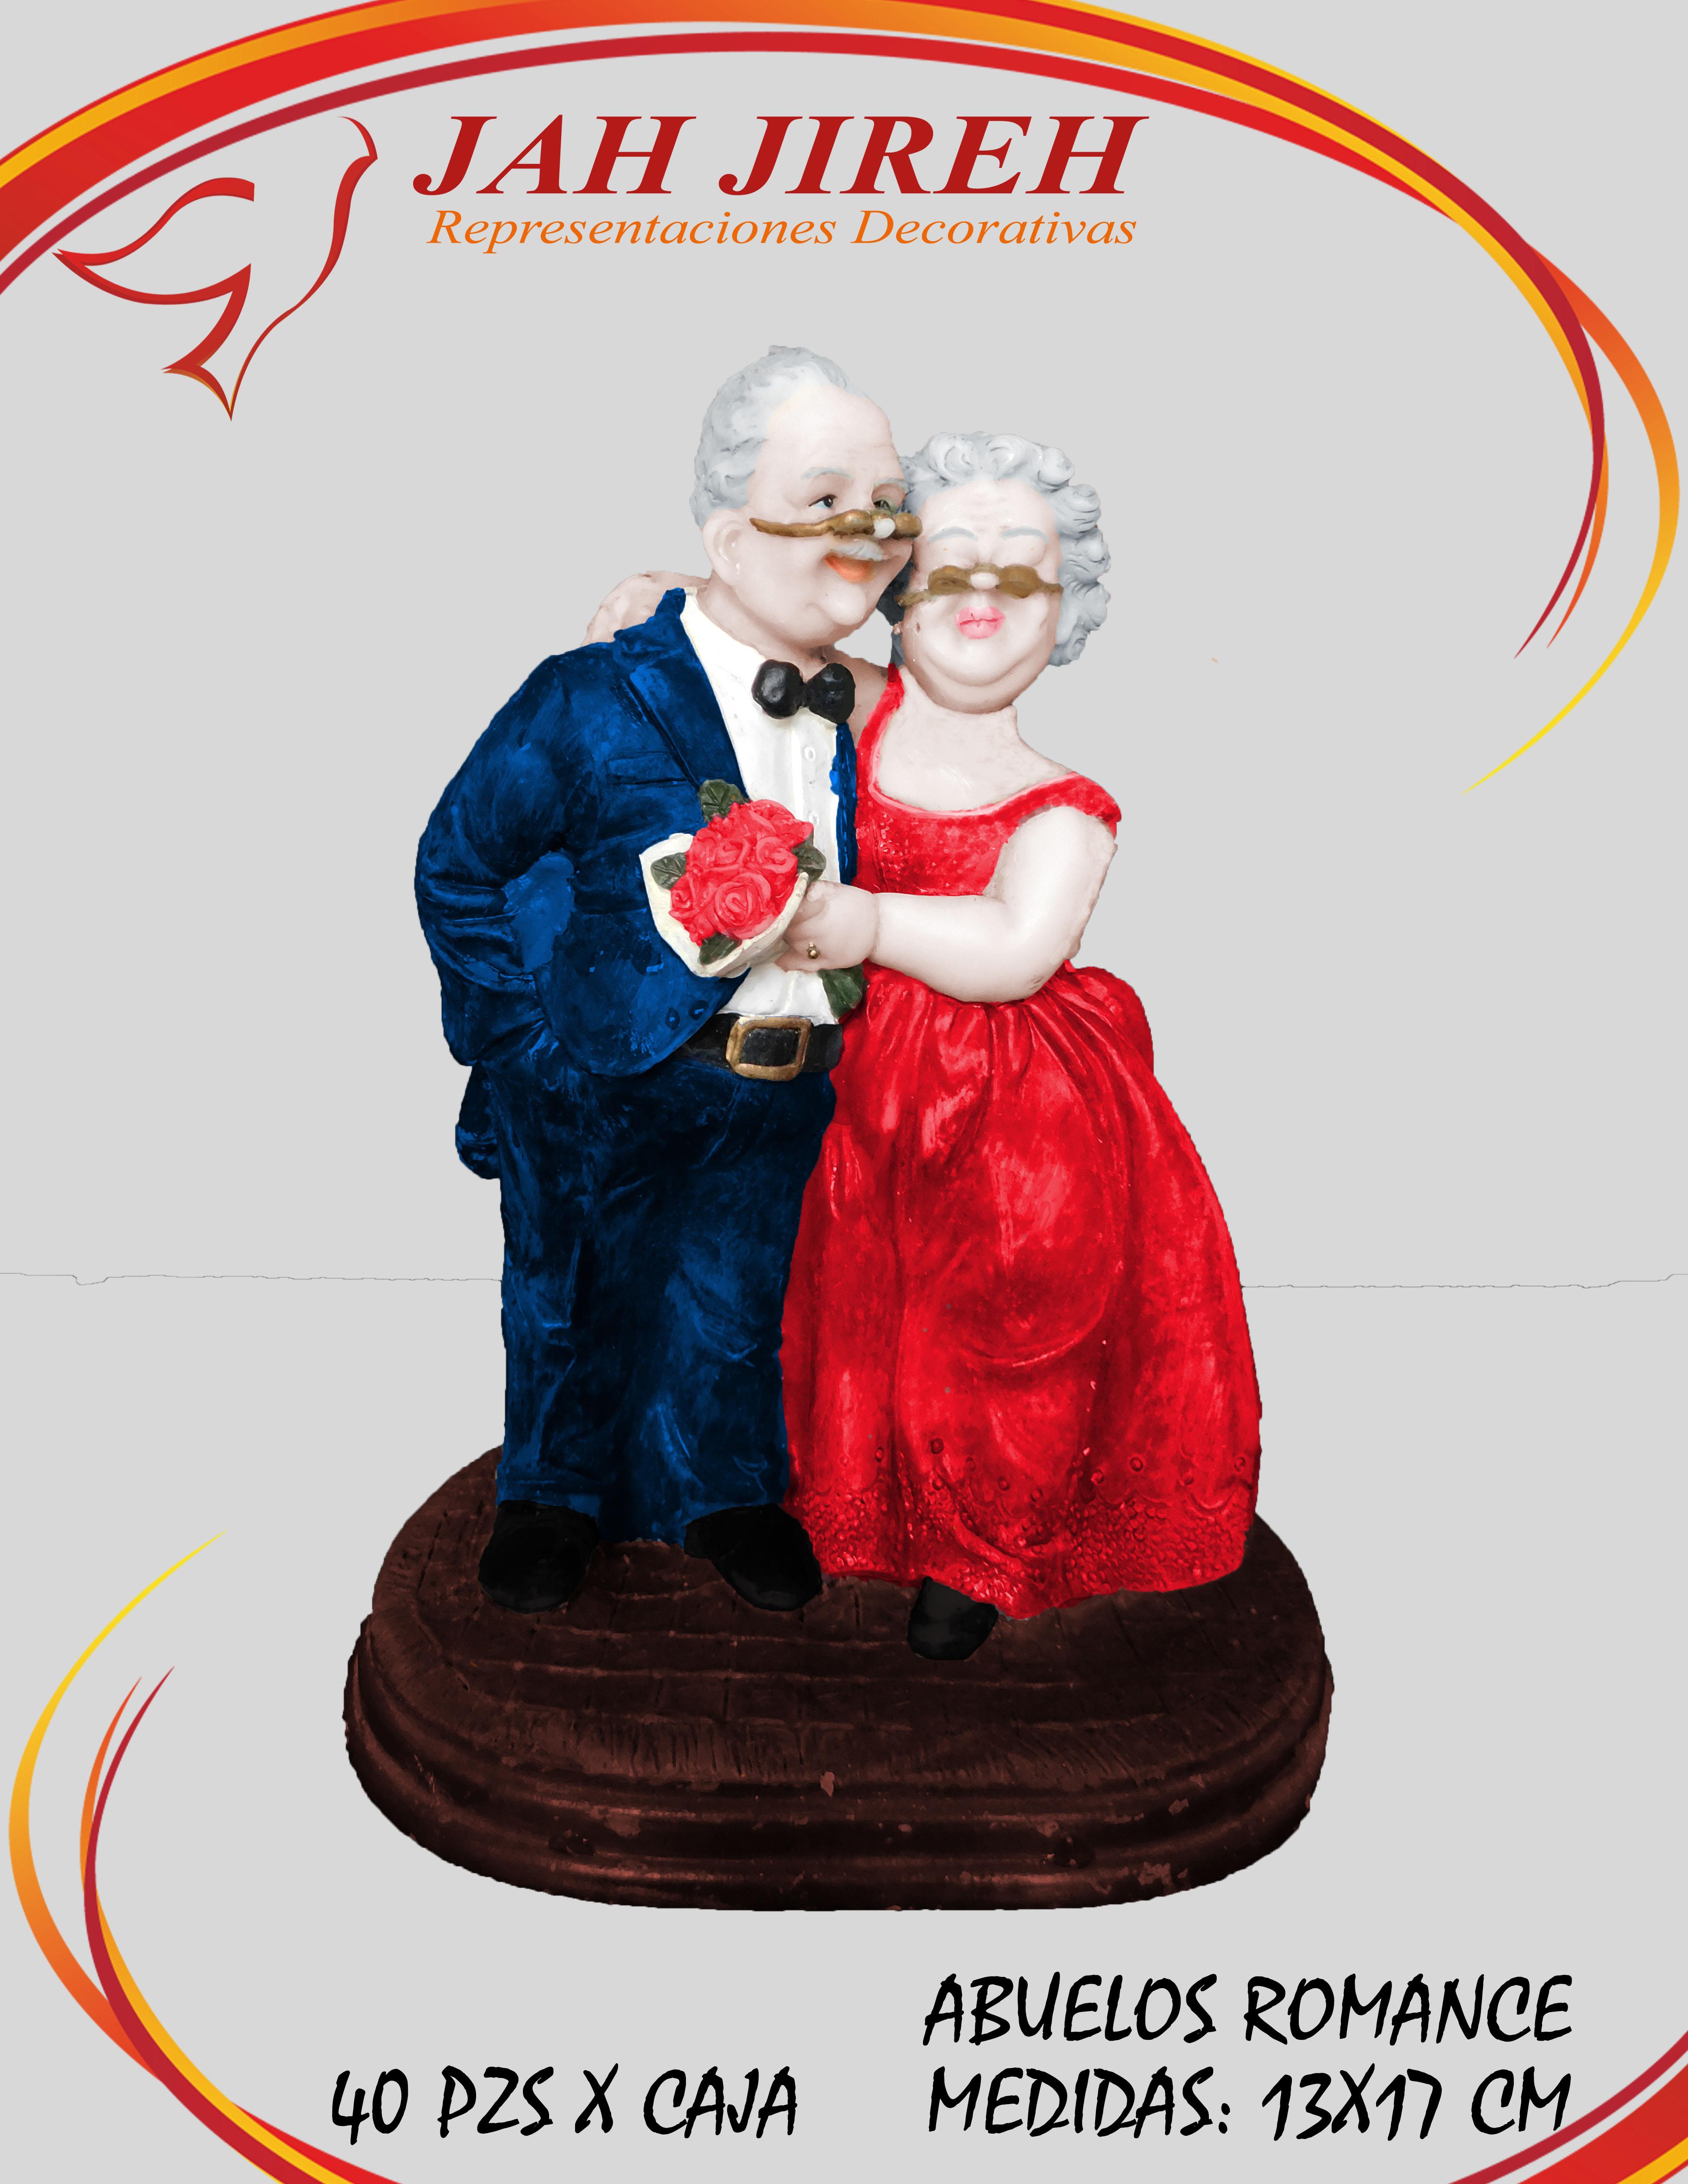 https://0201.nccdn.net/1_2/000/000/106/034/abuelos-romance.jpg